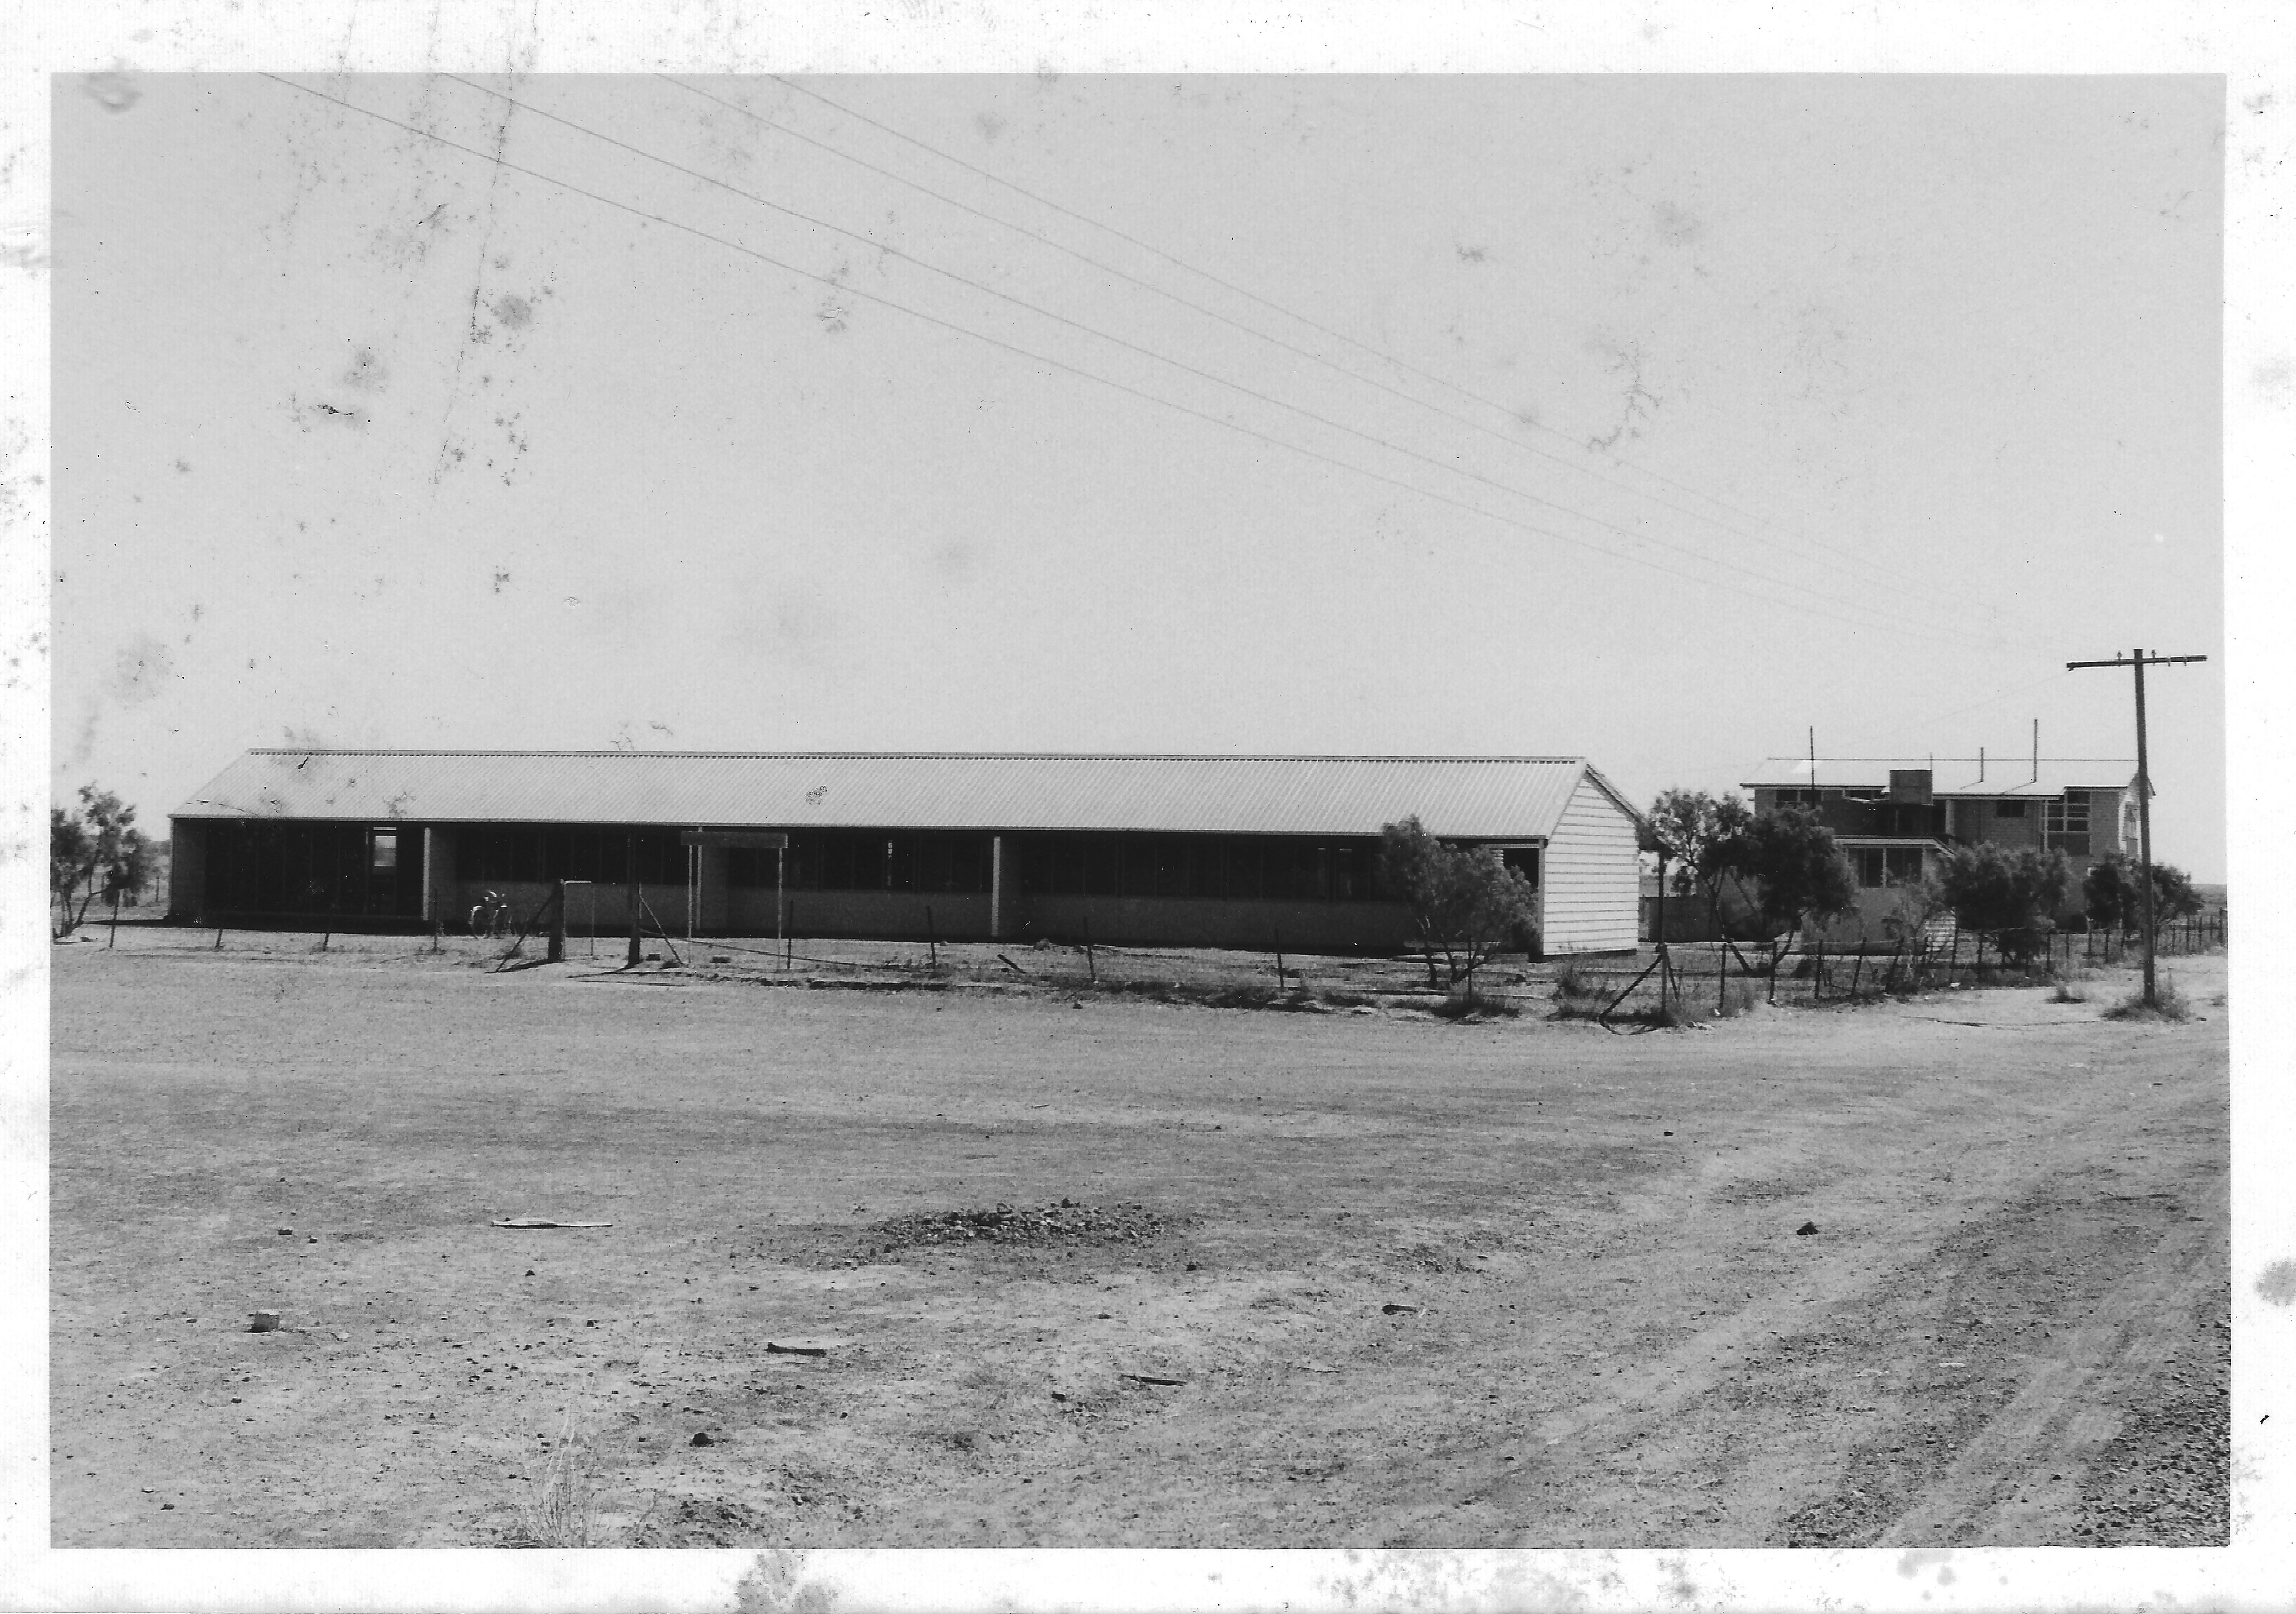 b'town 74 school, principal's house